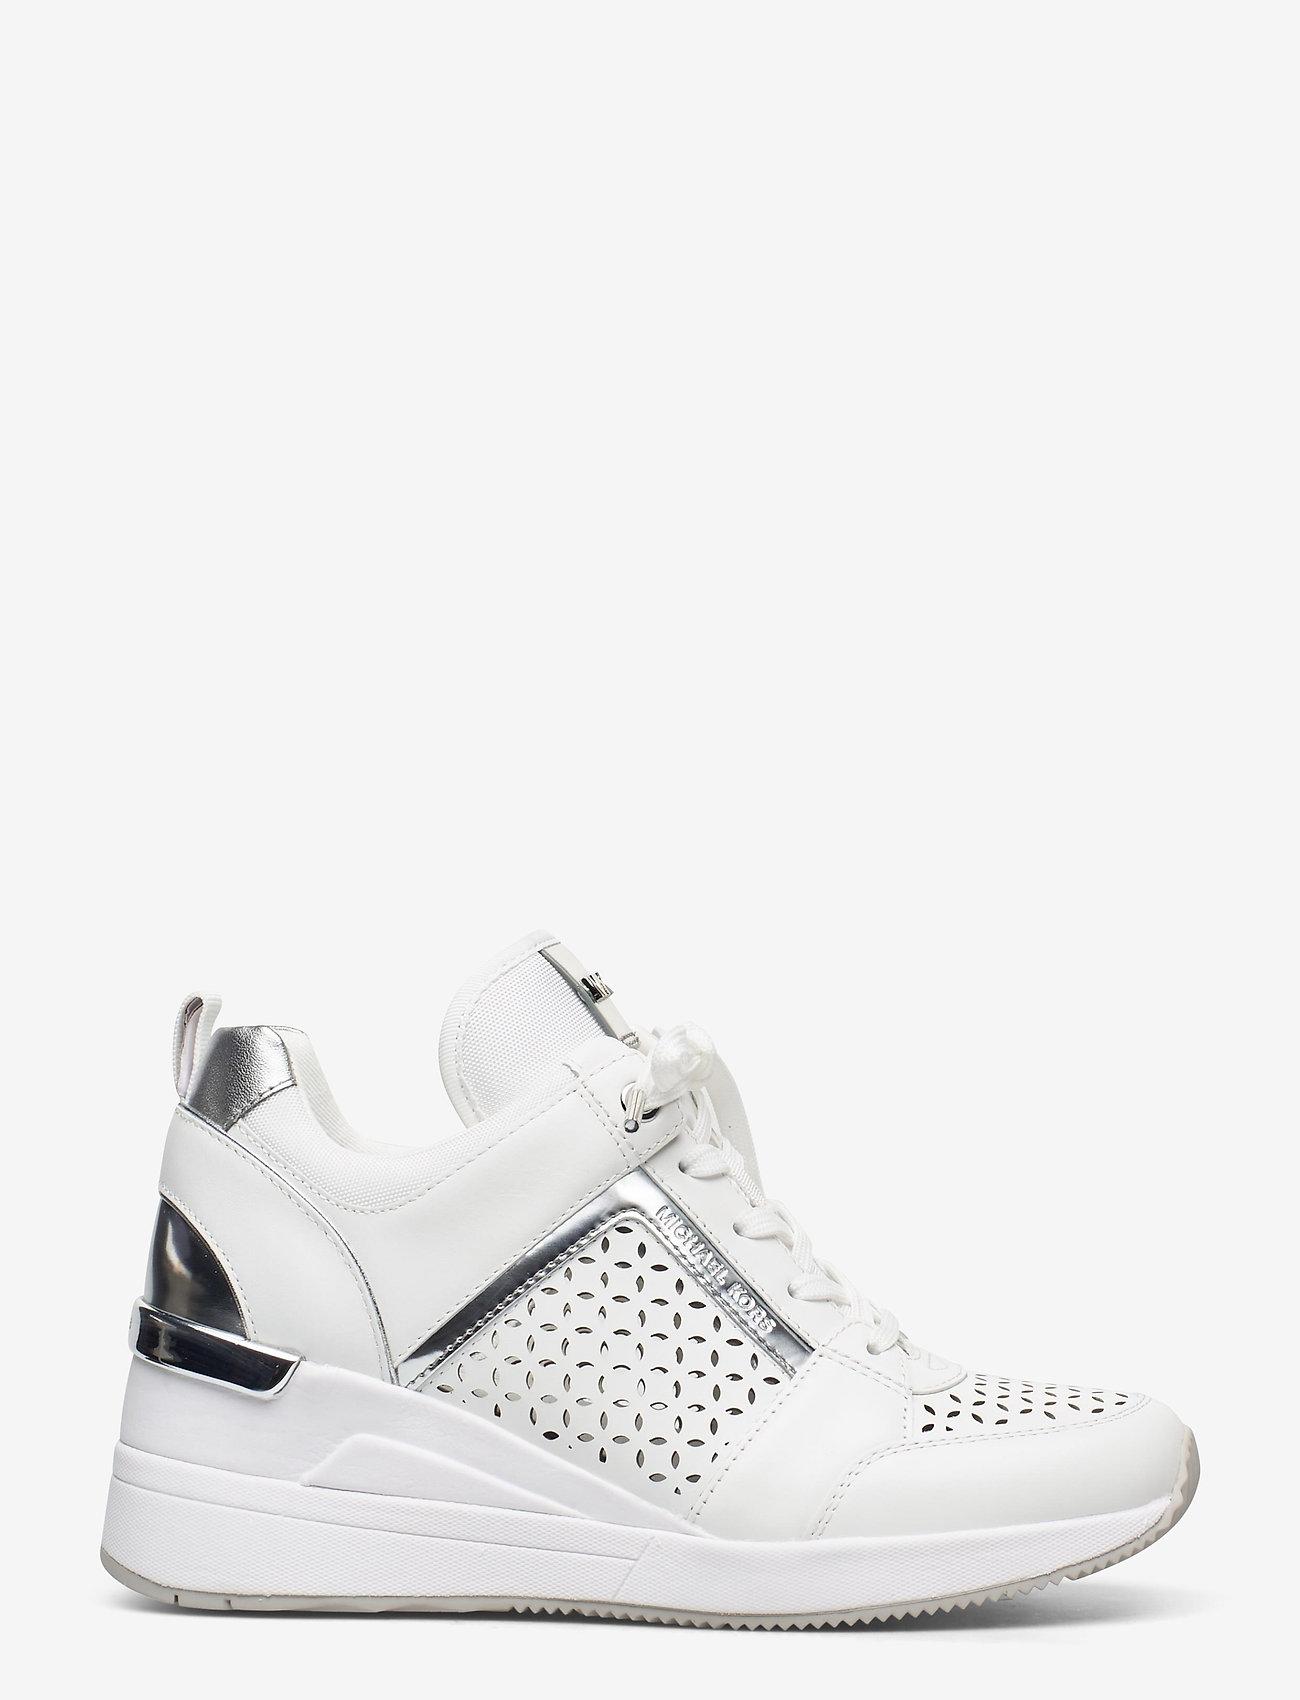 Michael Kors Shoes - GEORGIE TRAINER - hoge sneakers - optic white - 1